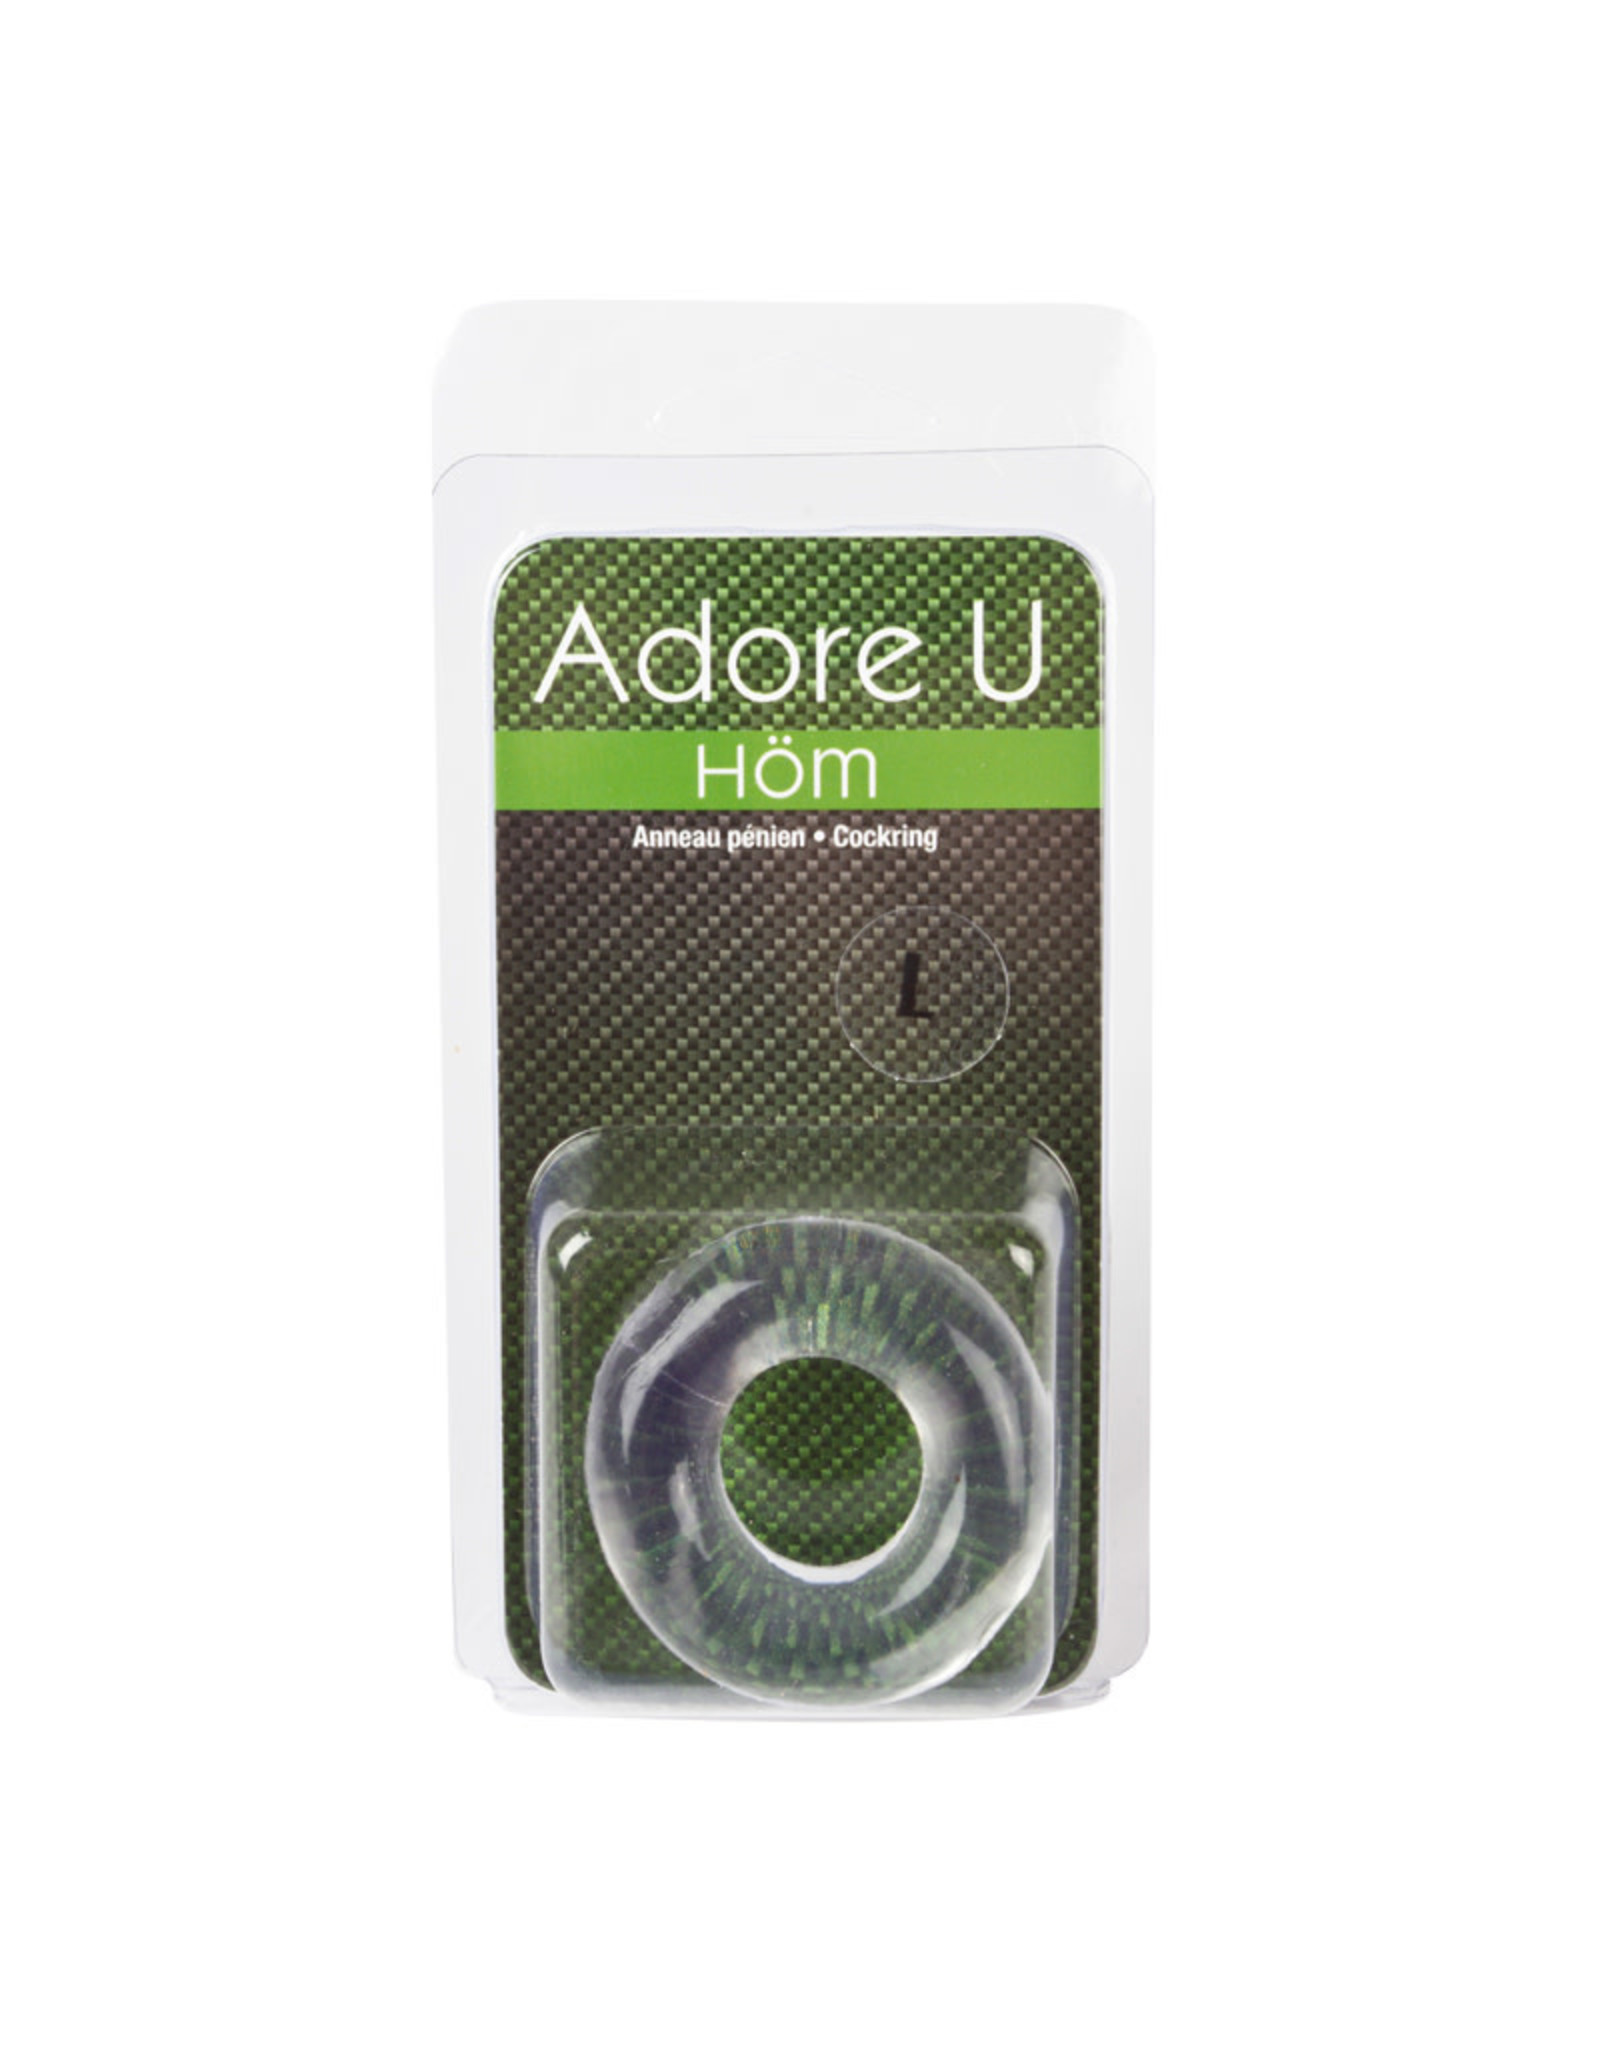 Adore U Adore U Hom - Large Cock Ring (clear)